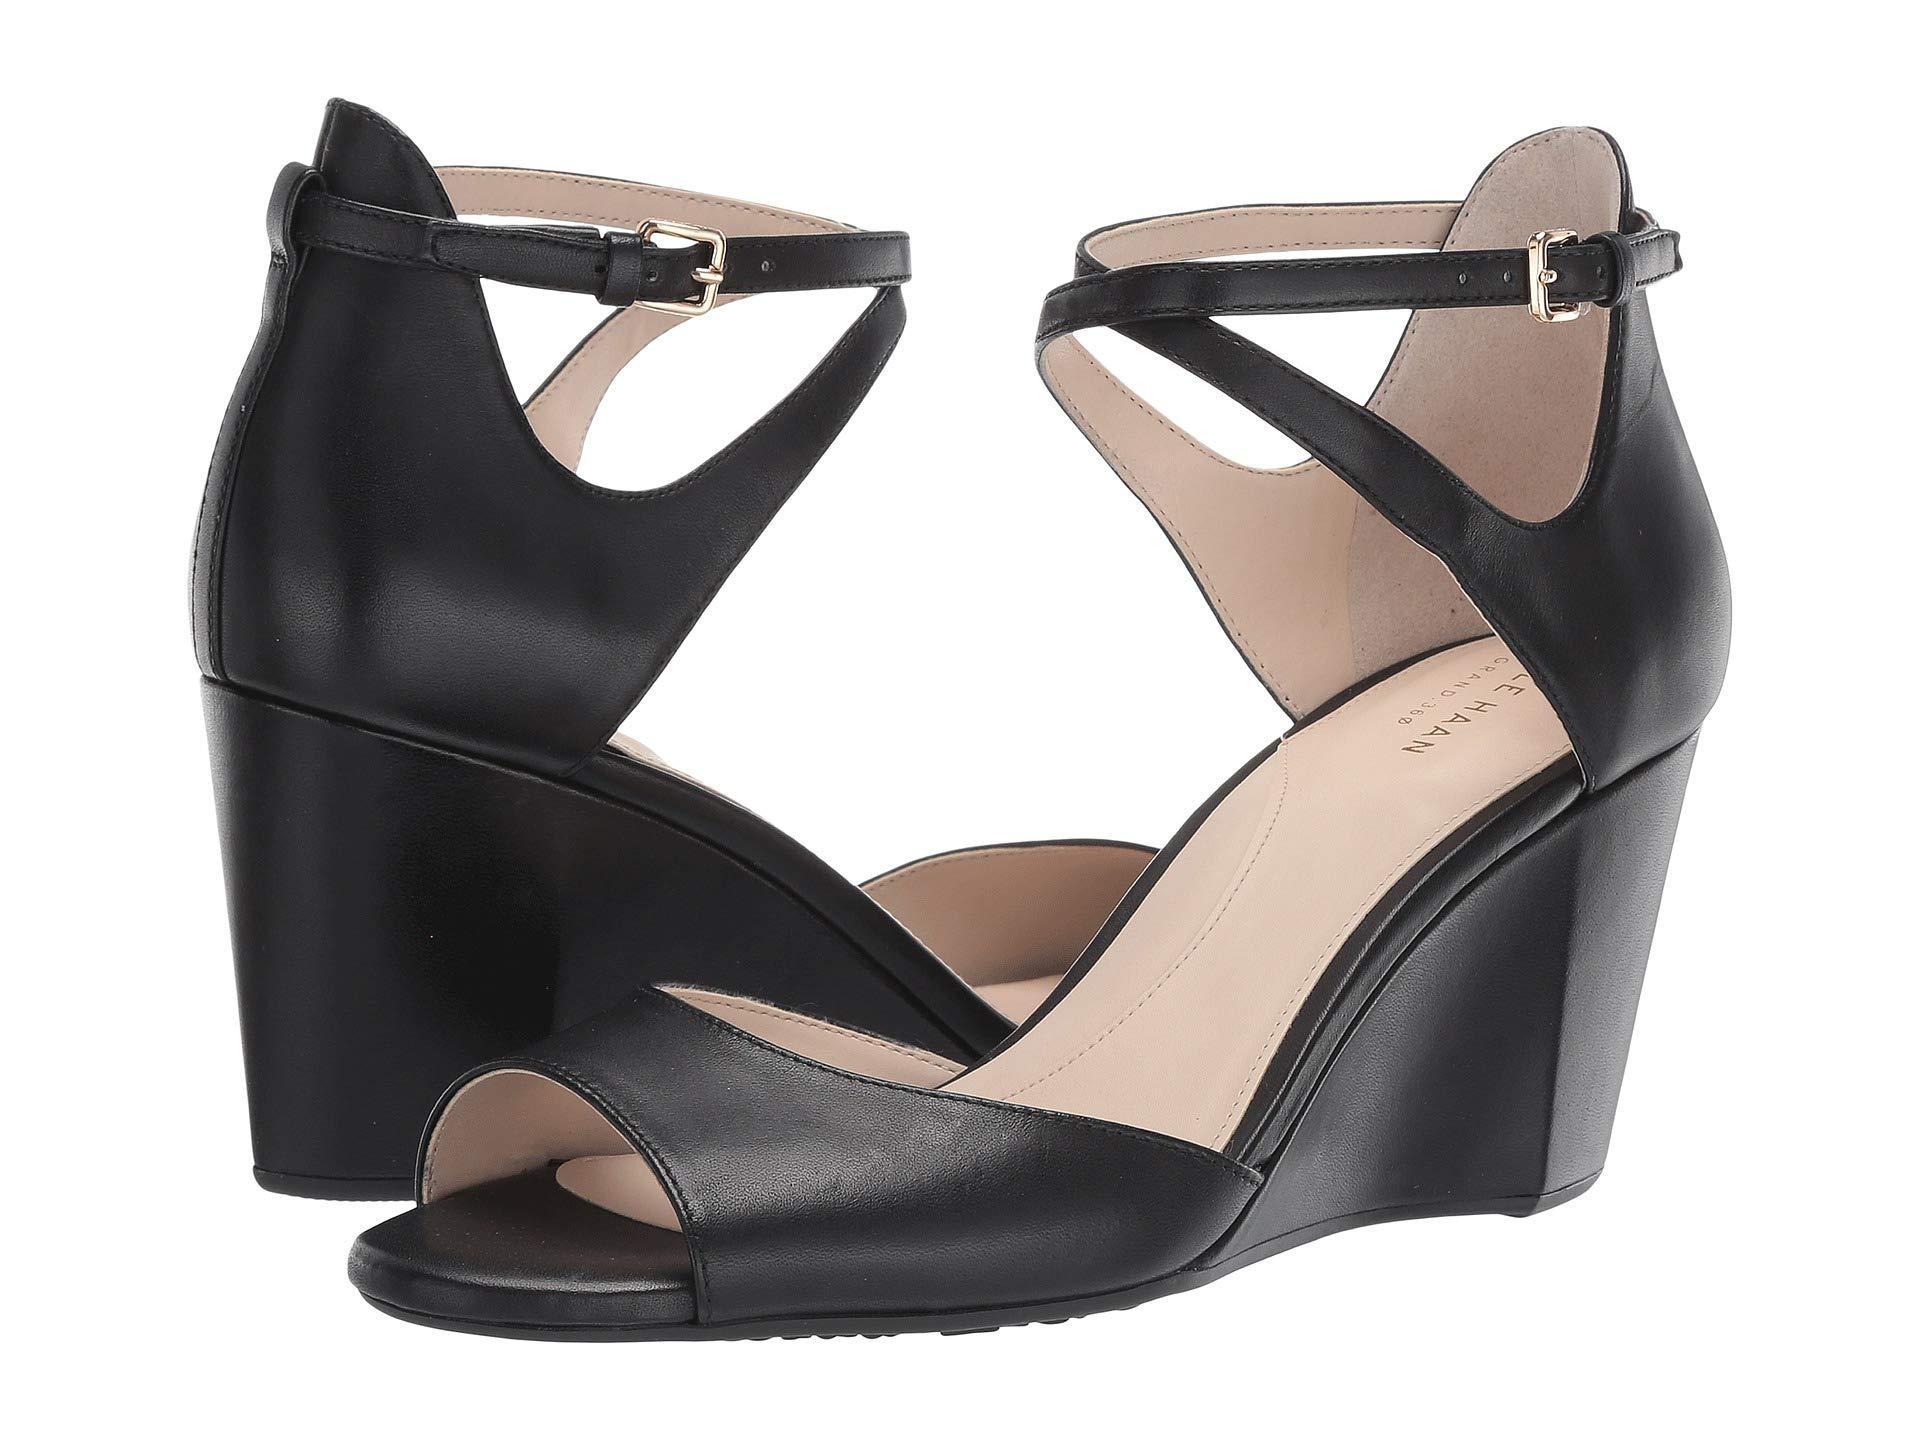 acb74881022 Lyst - Cole Haan 75 Mm Sadie Grand Open Toe Wedge Sandal (mahogany ...